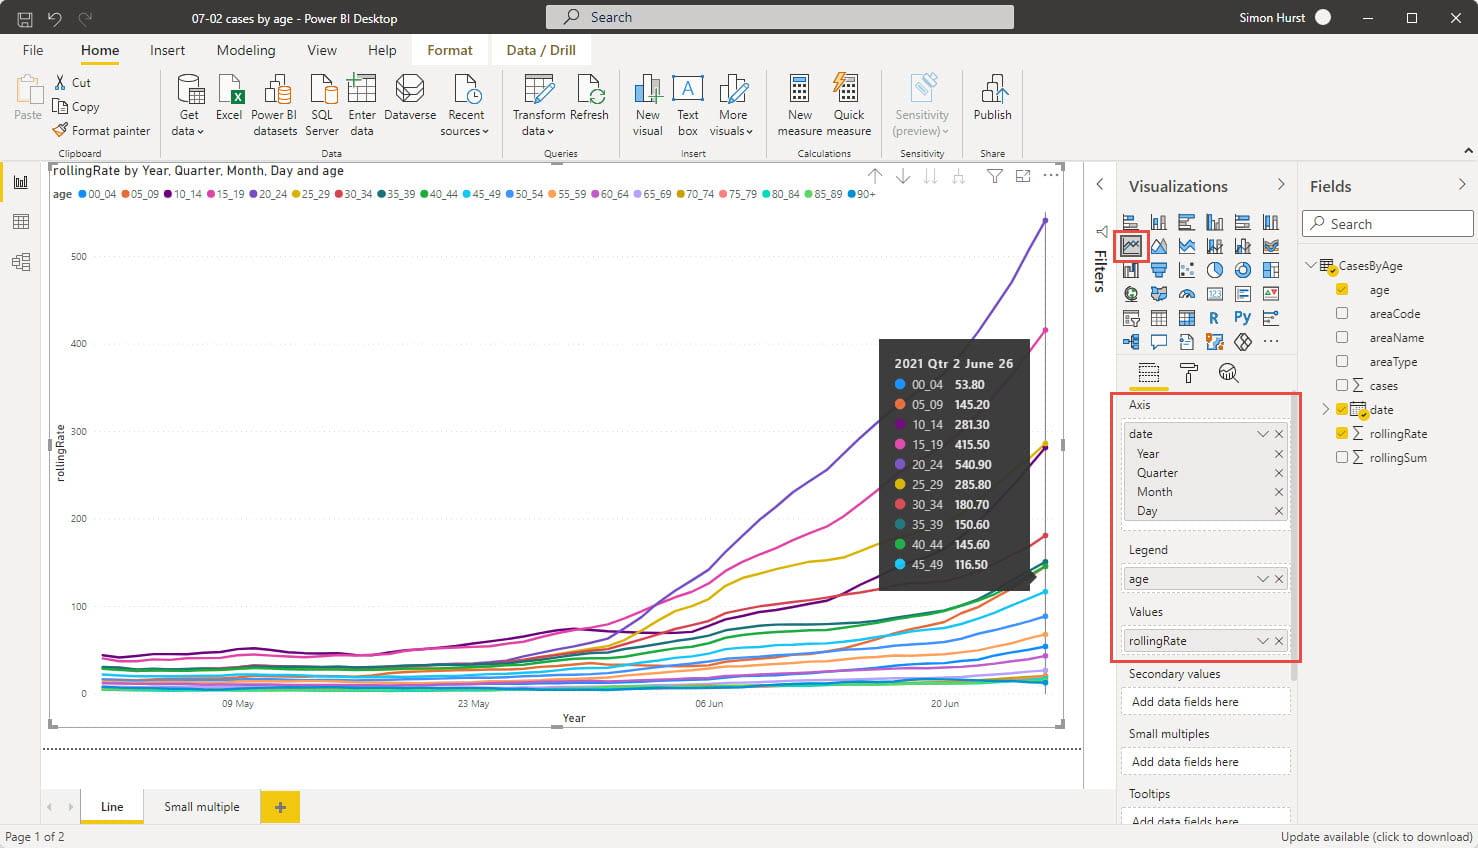 screenshot of power bi chart